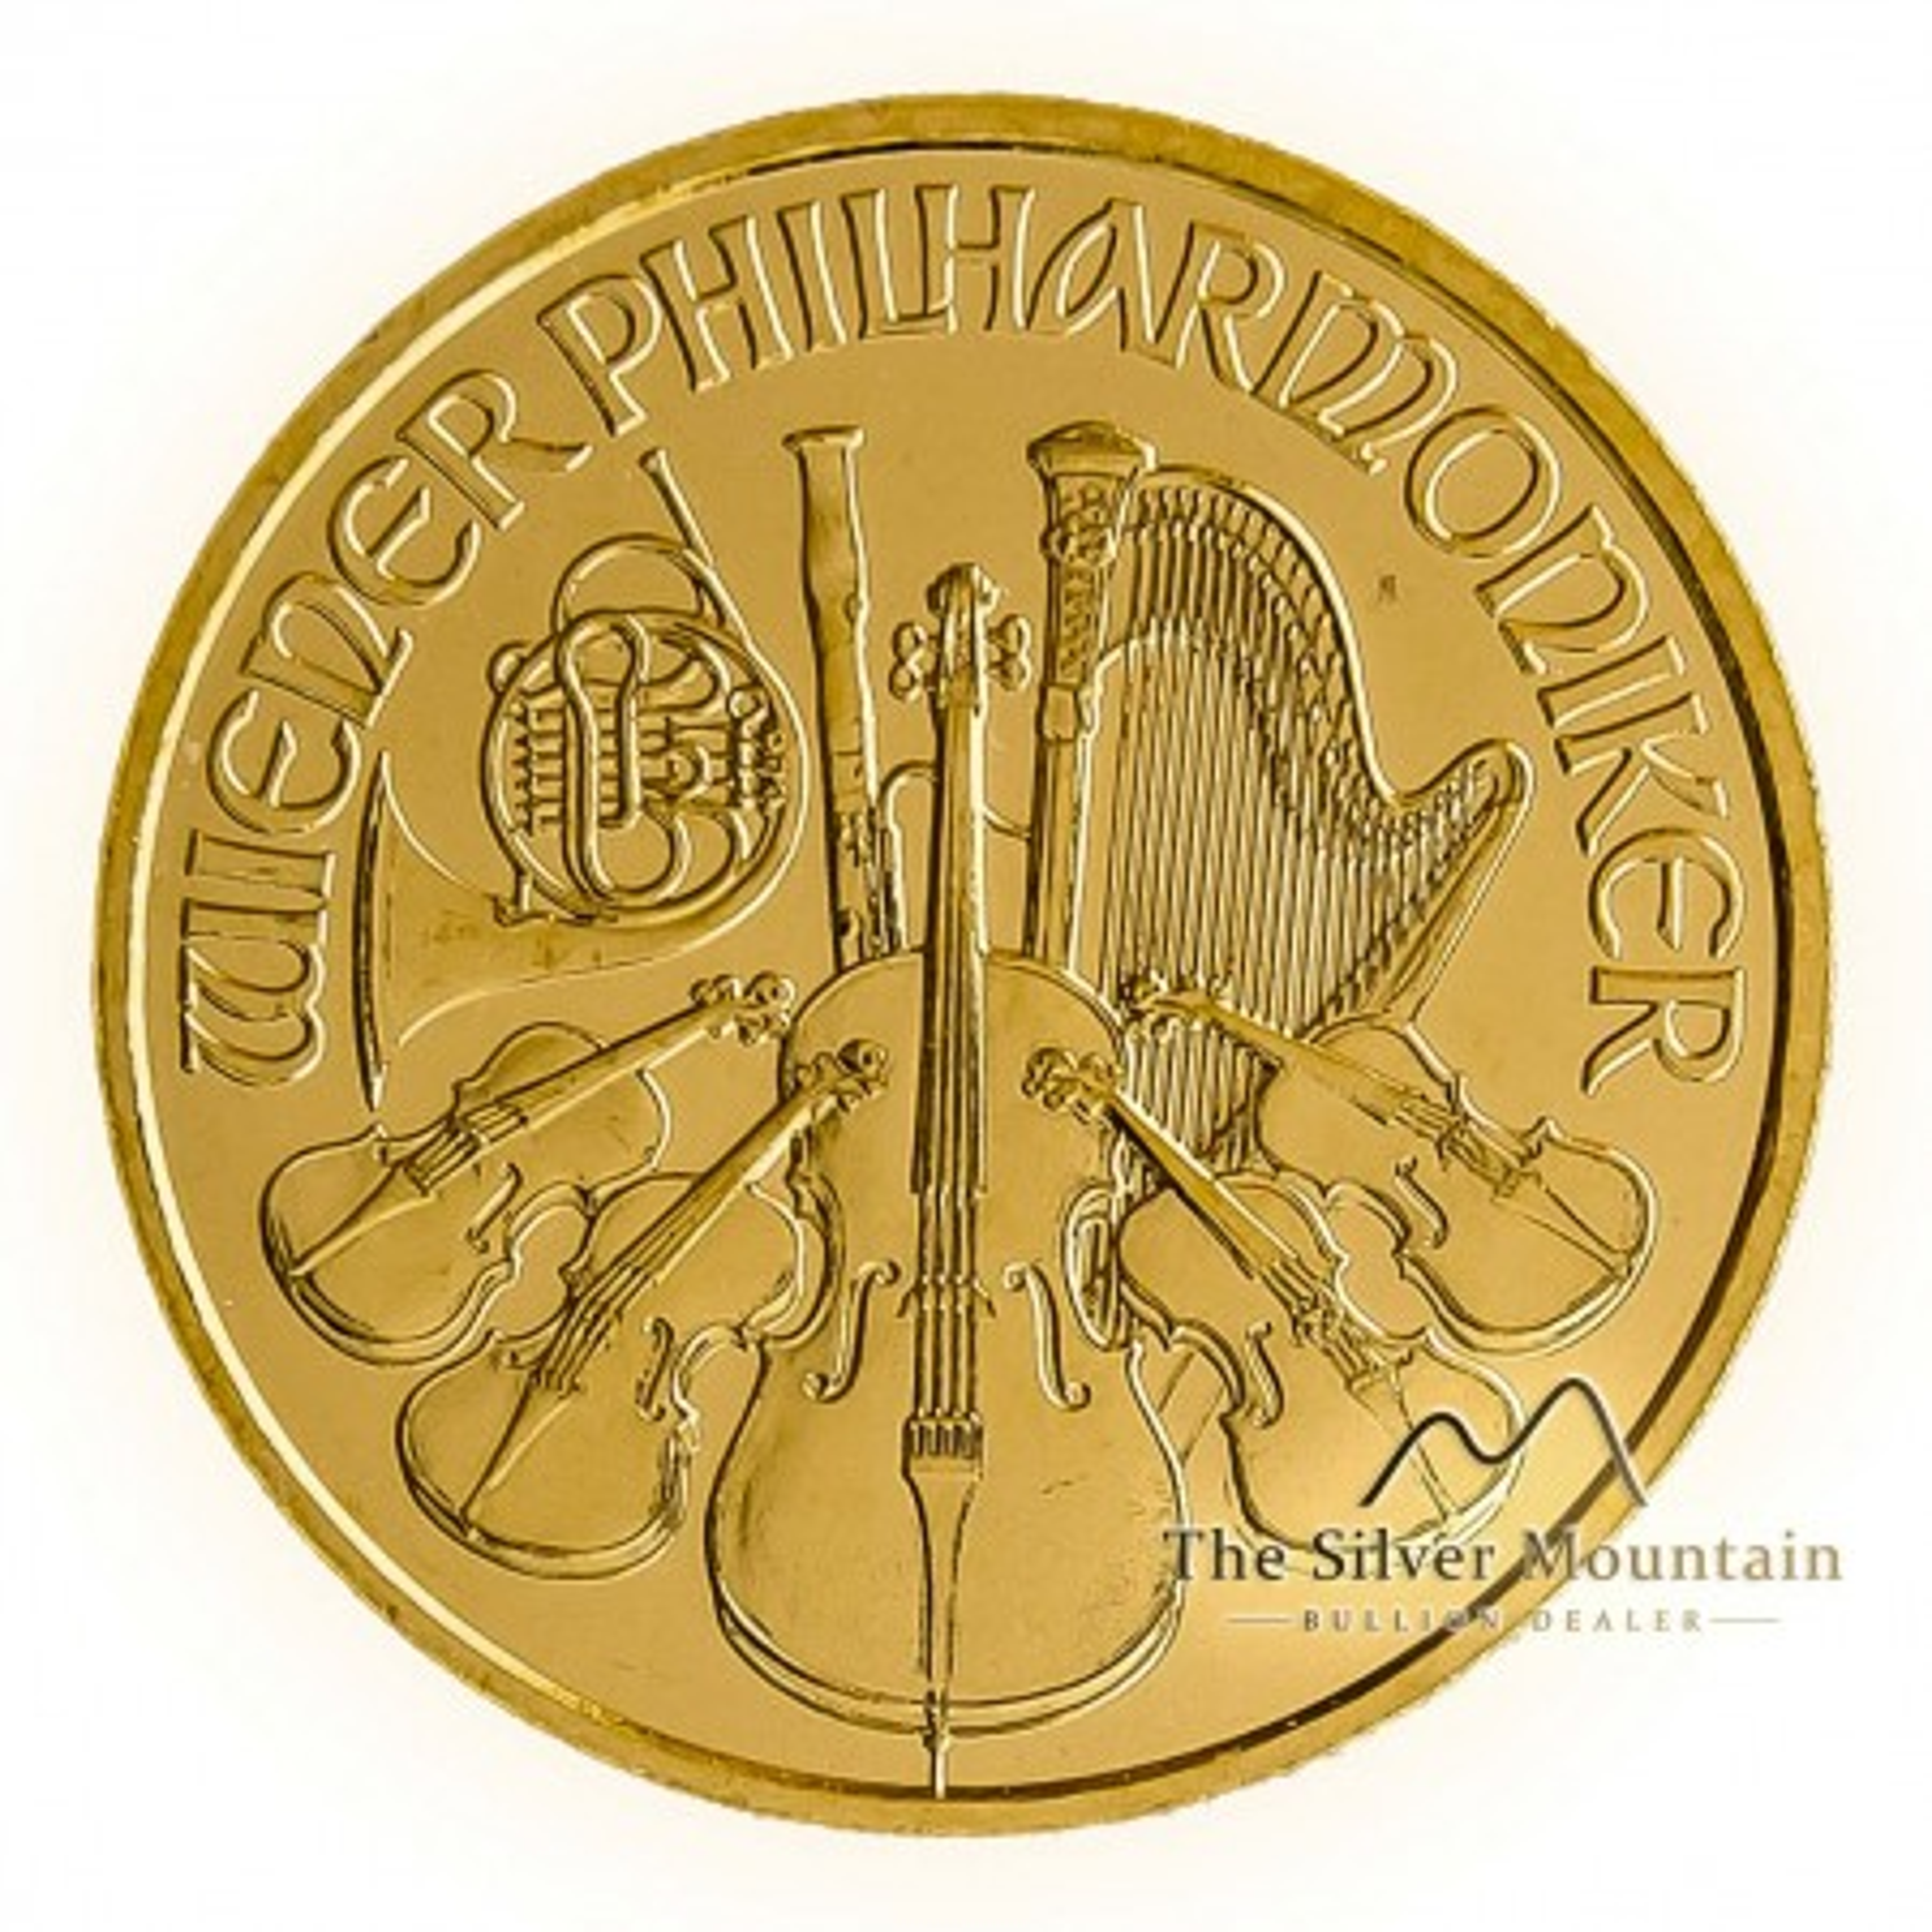 Gouden 1/10 troy ounce Philharmoniker munt